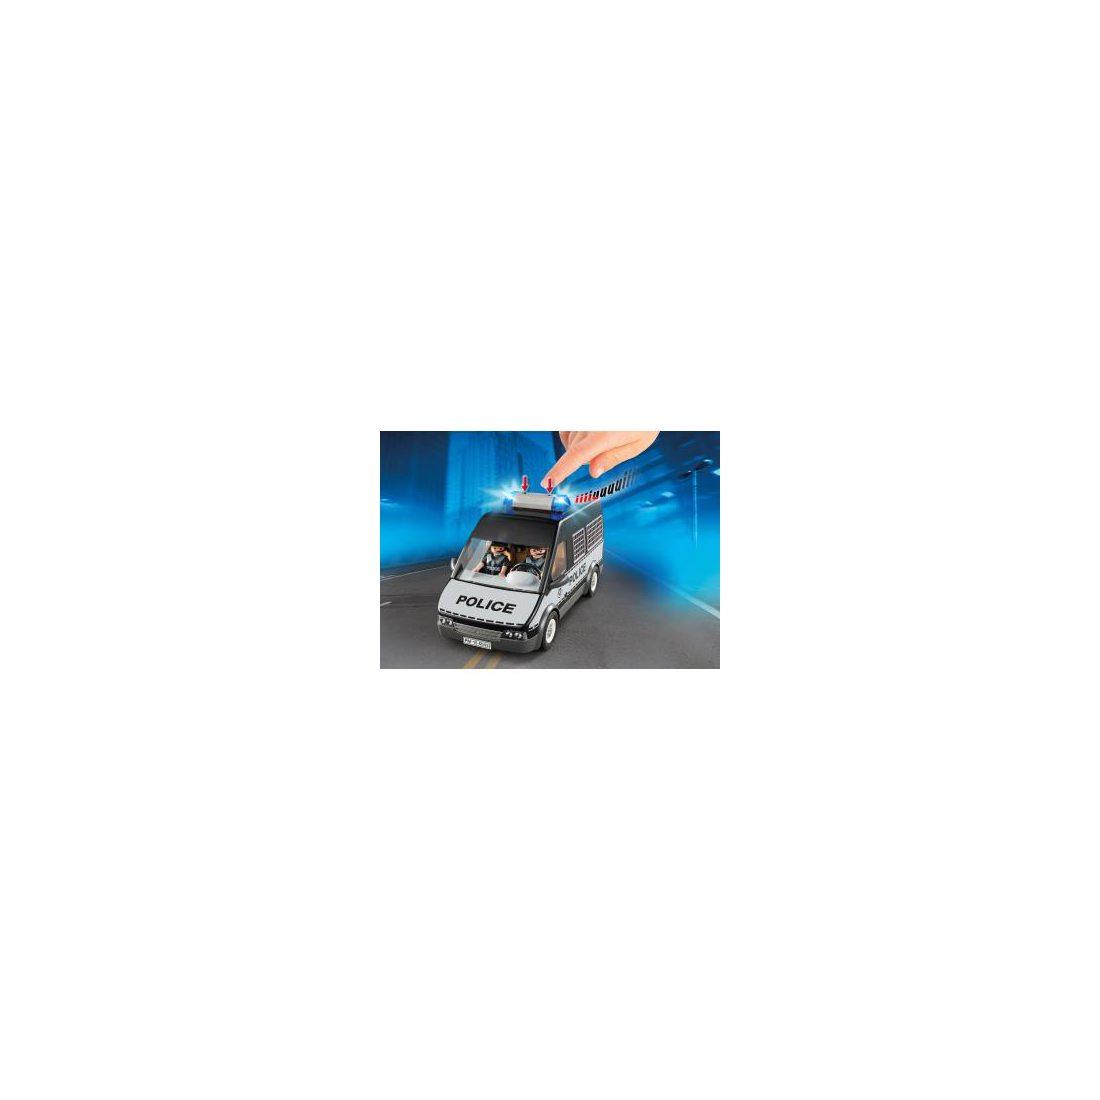 Playmobil City Action 6043 Fourgon de police avec sirène et gyrophare